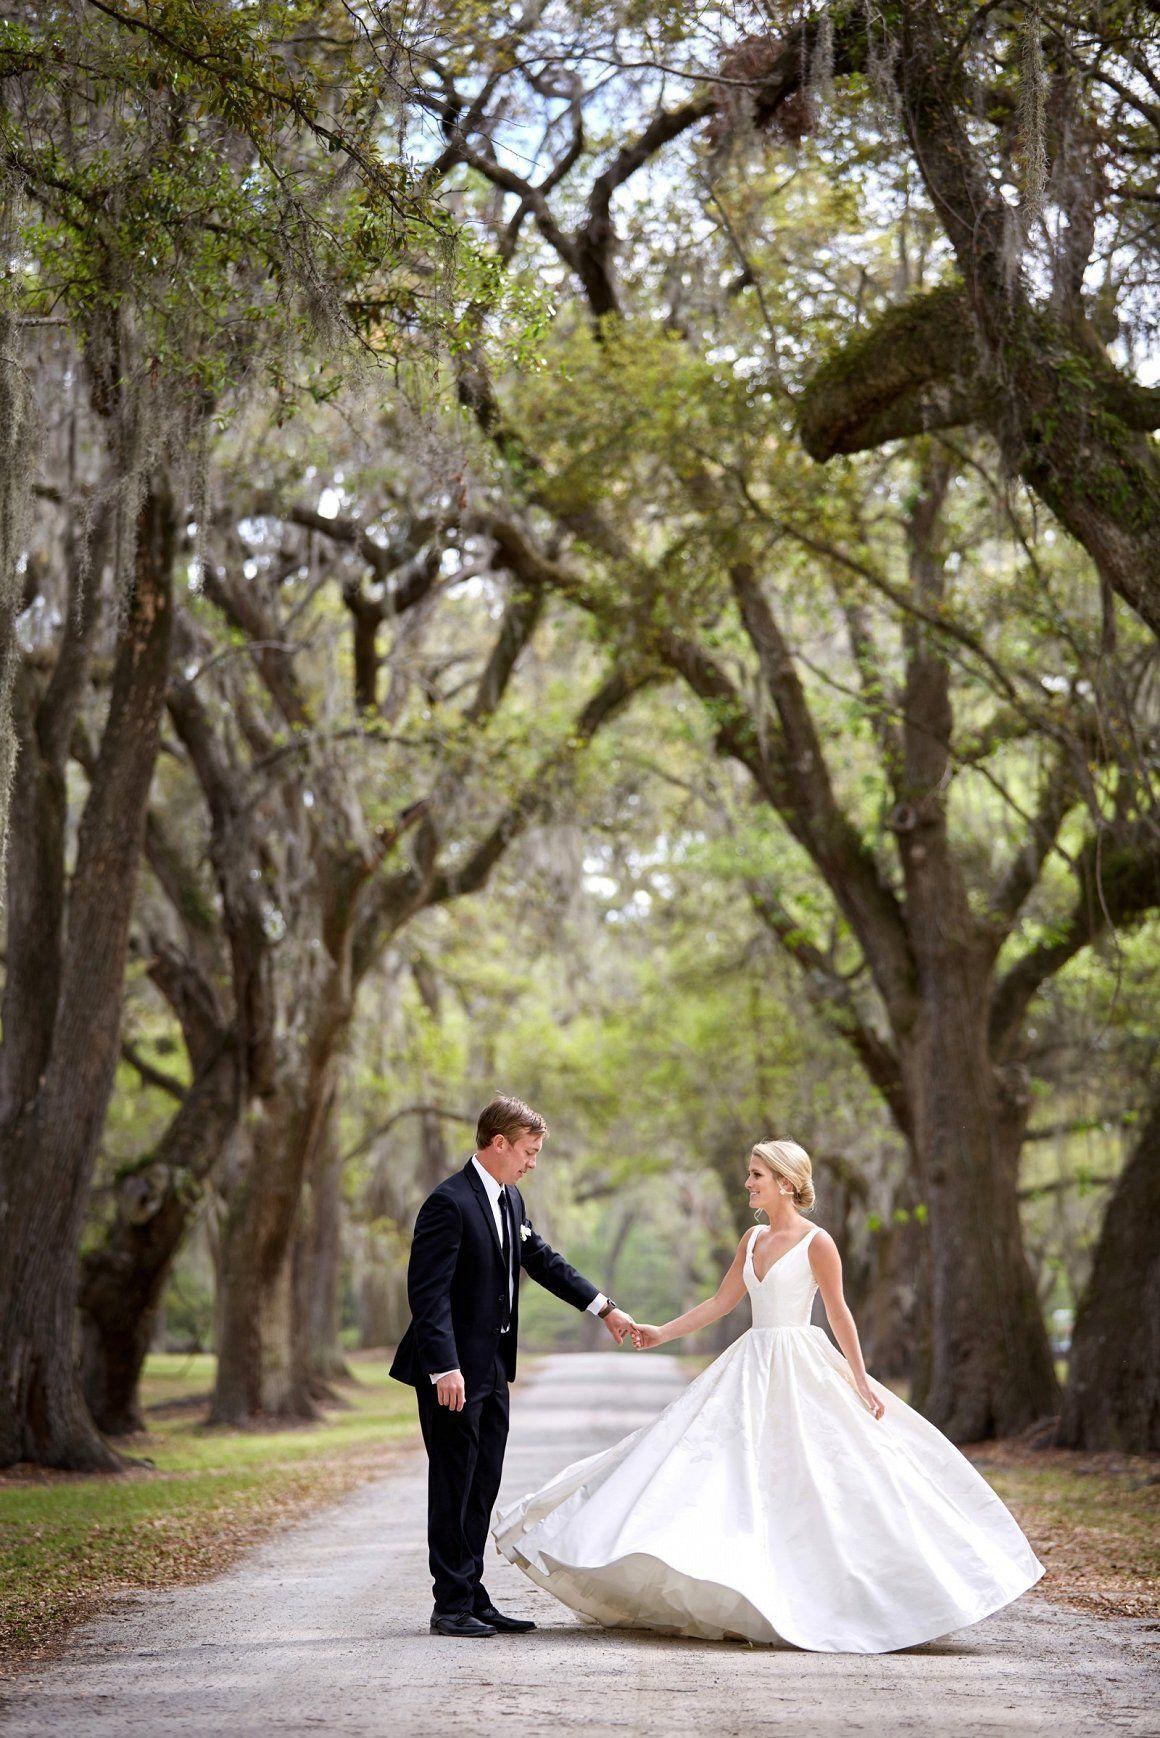 Tented charleston wedding by christian oth studio fairytale